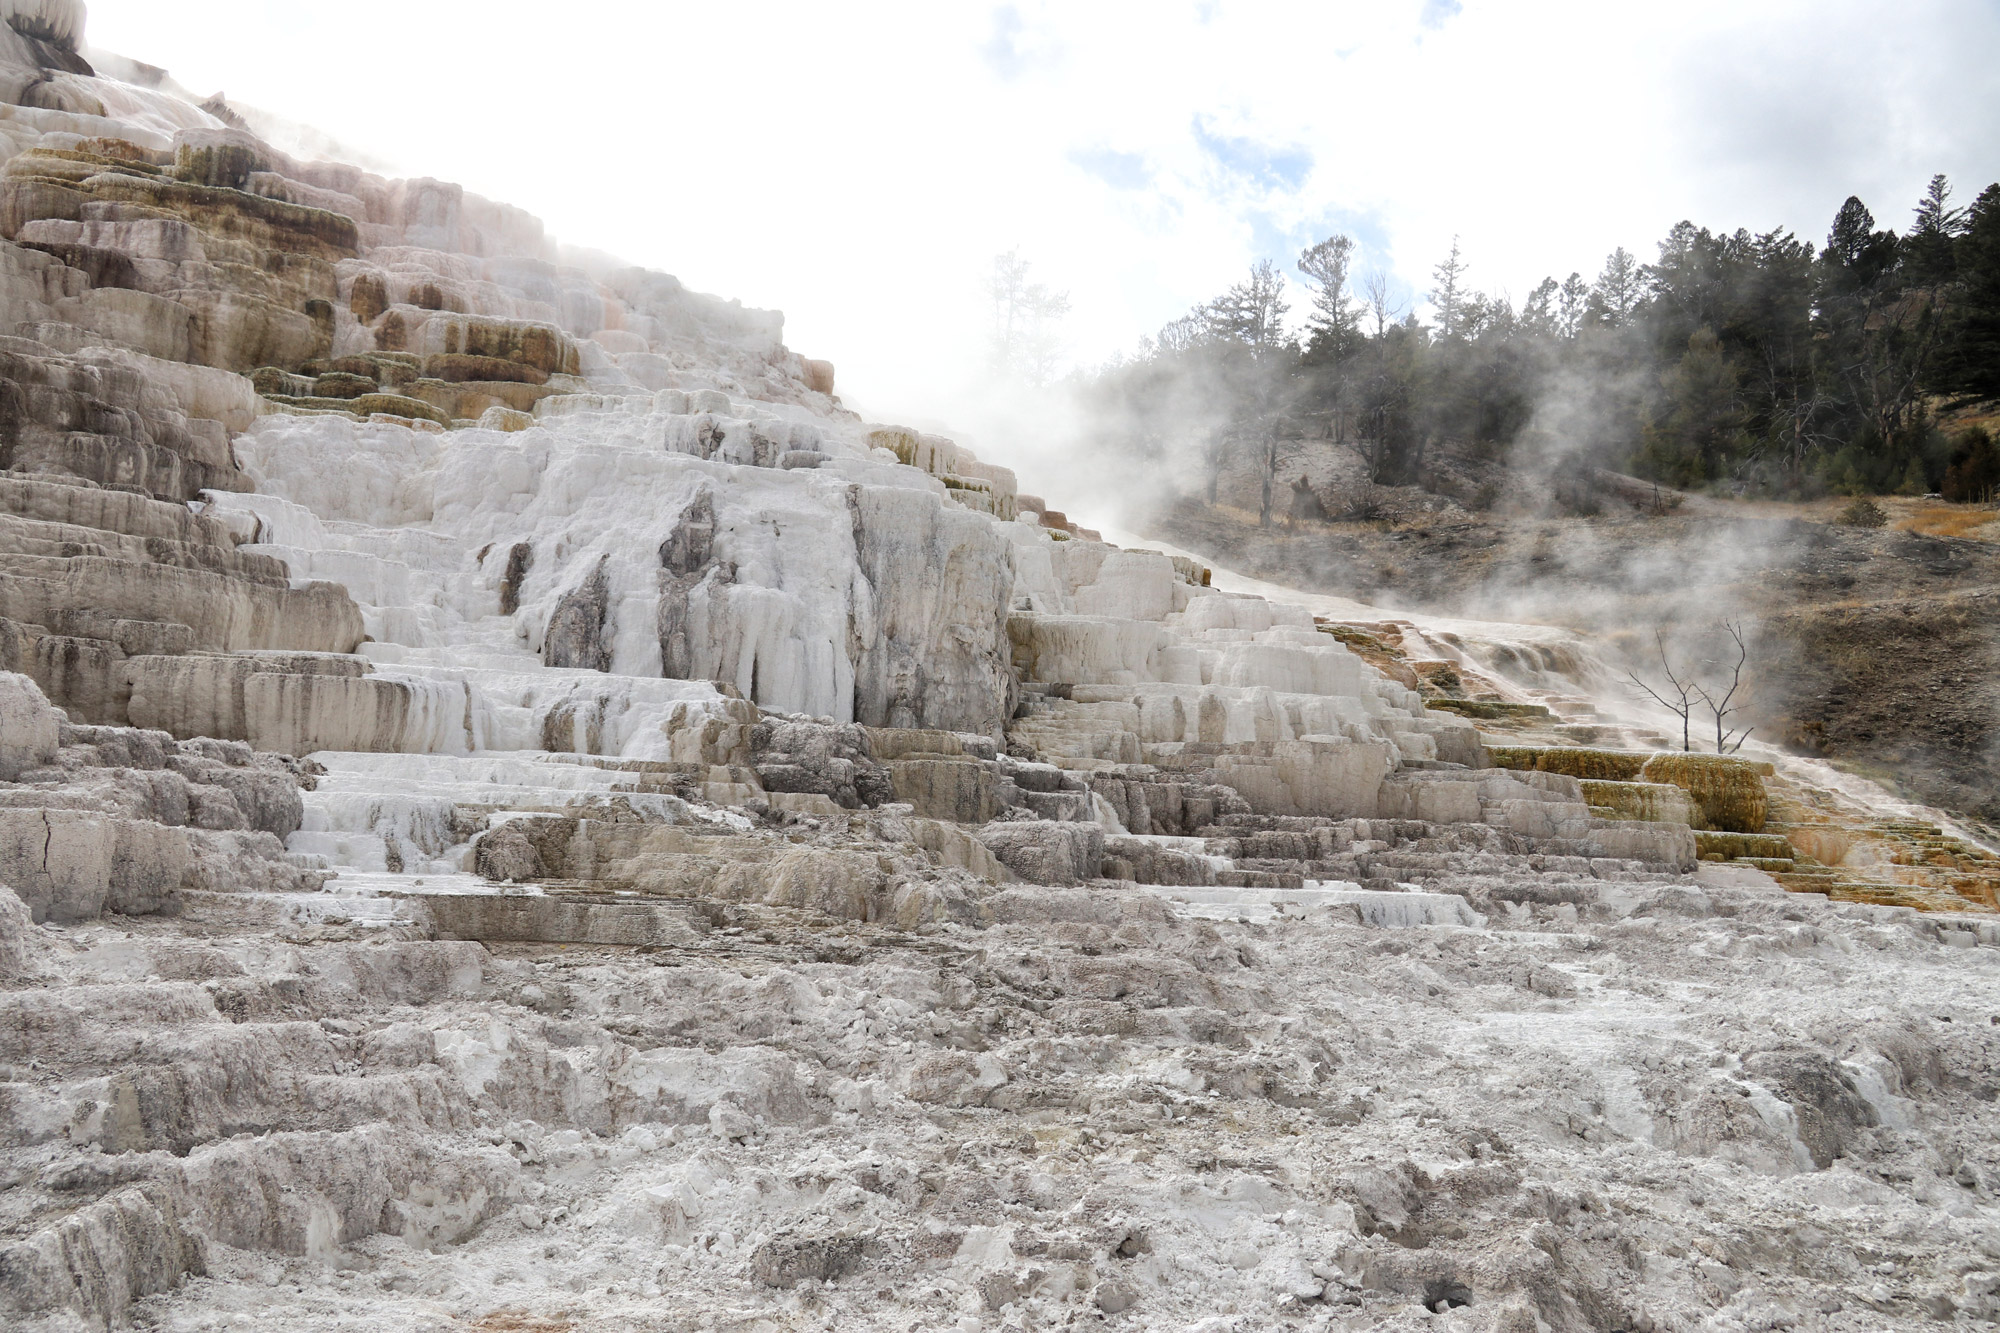 De hoogtepunten van Yellowstone National Park - Mammoth Hot Springs